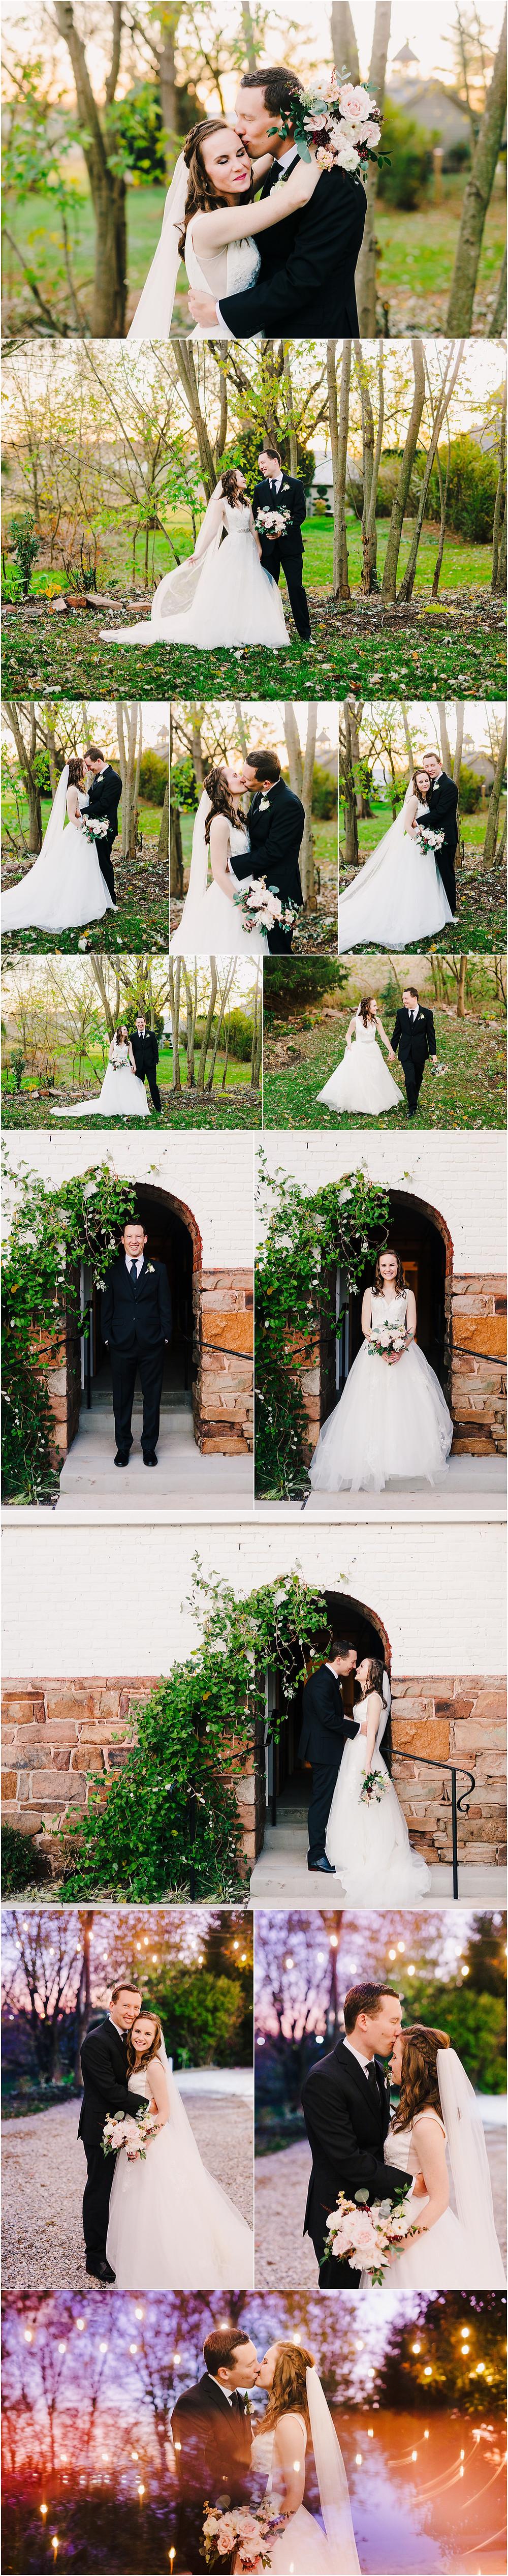 Sunset Wedding Portraits Baltimore Wedding Photography